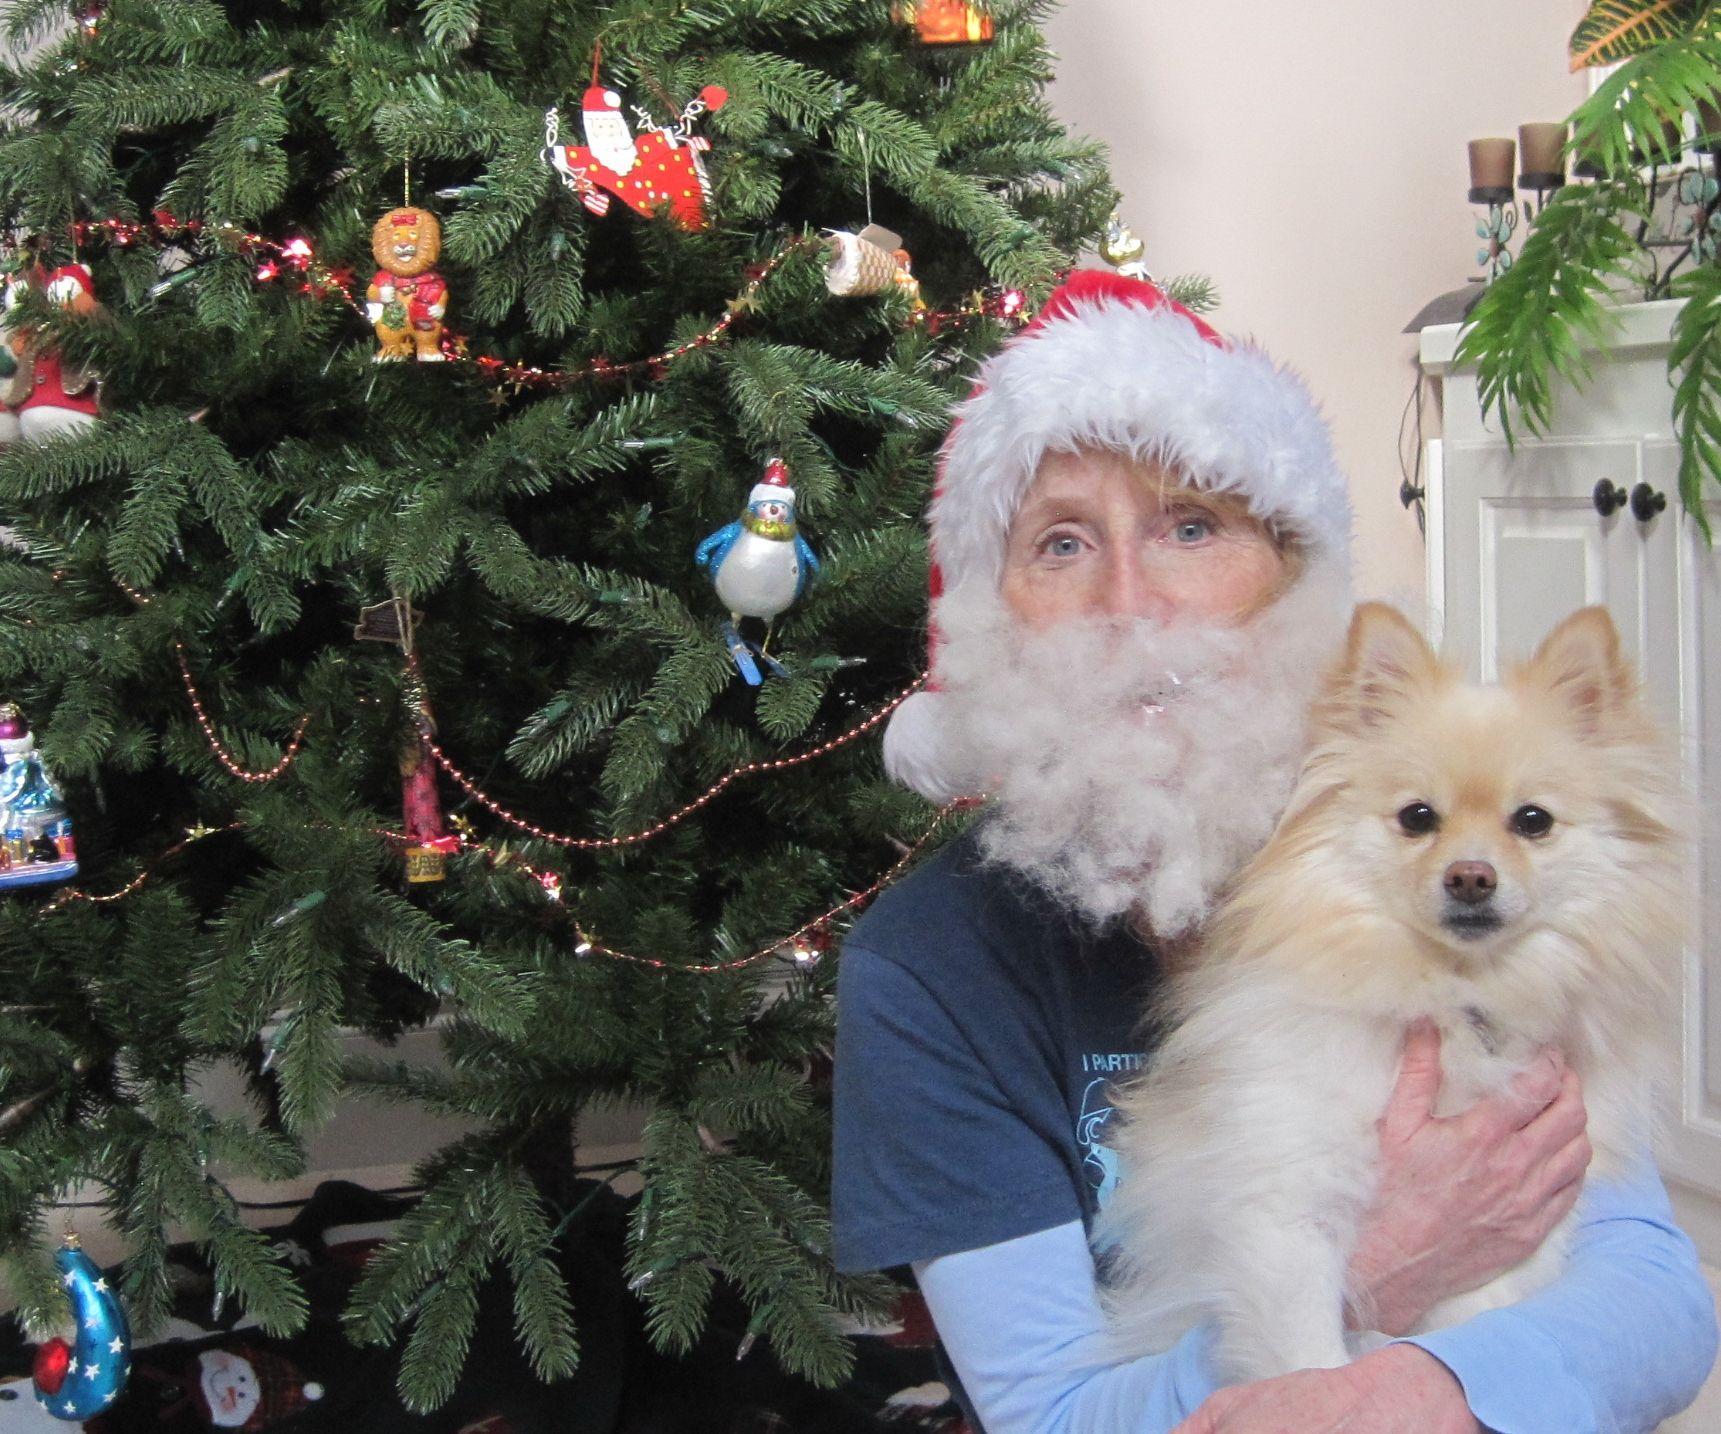 How to make a Santa beard from dog hair